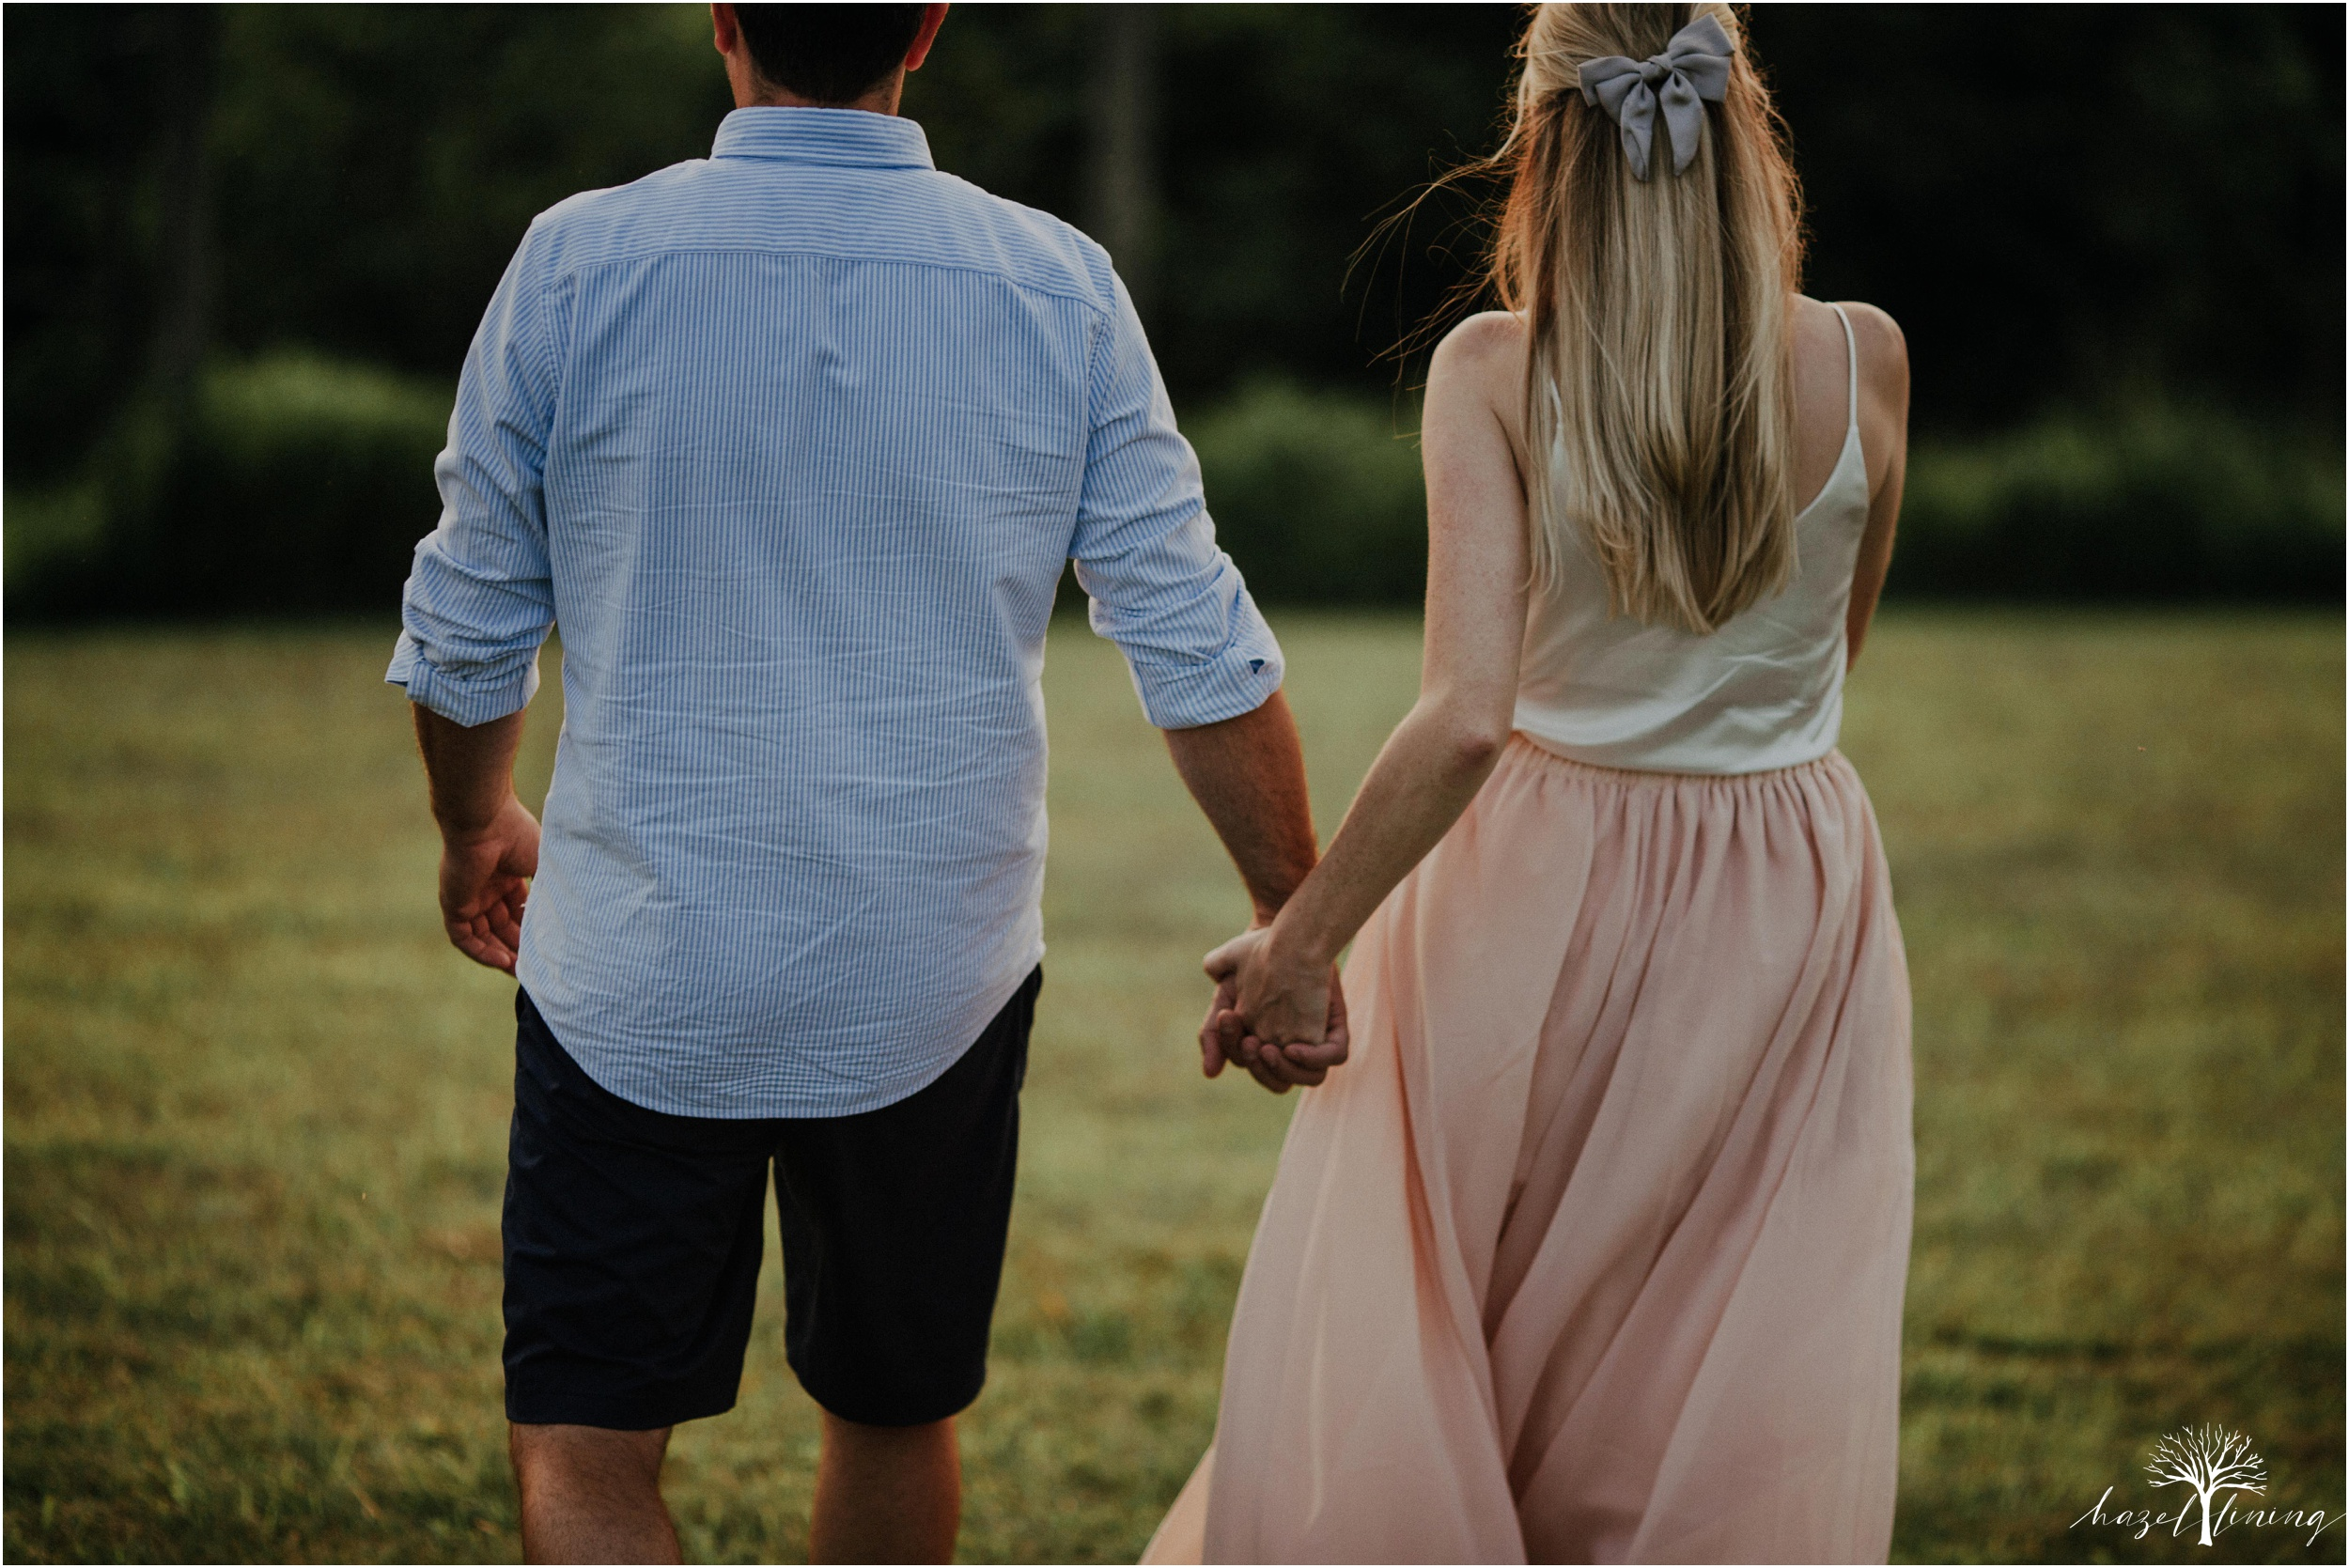 ashley-fillmore-steve-reimer-trexler-nature-preserve-summer-engagement-session-schnecksville-pennsylvania-hazel-lining-photography-destination-elopement-wedding-engagement-photography_0054.jpg